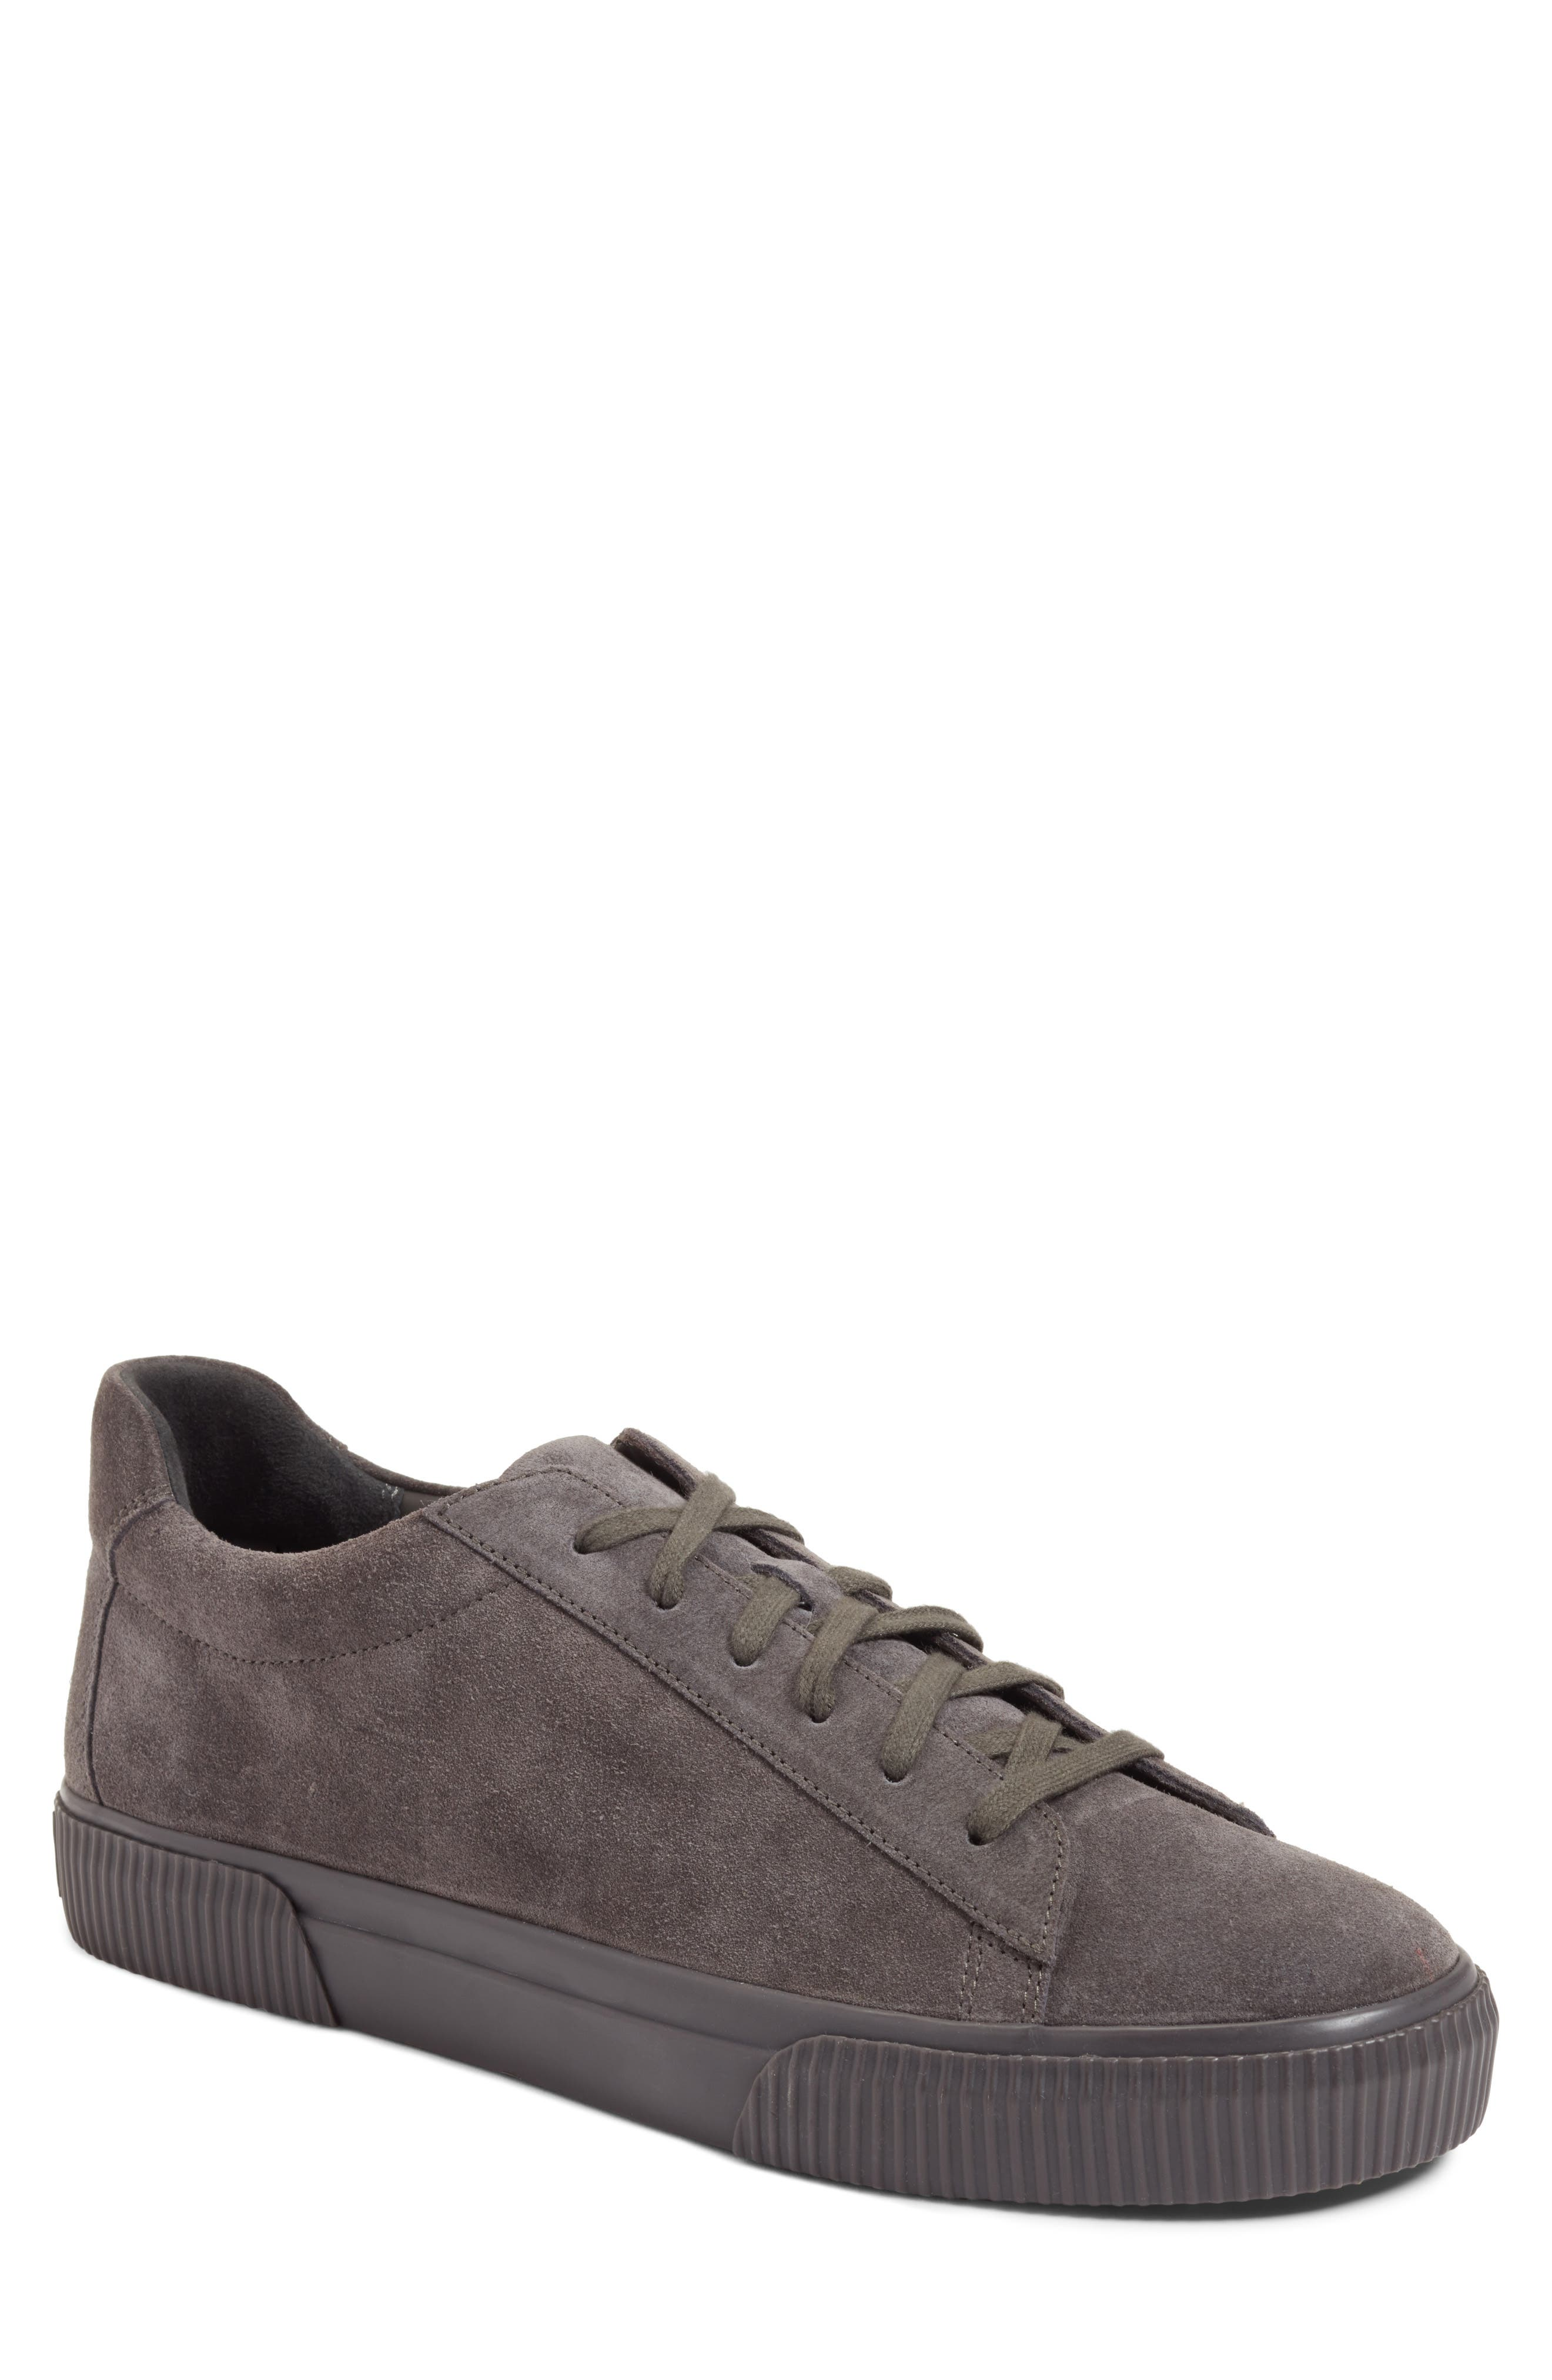 Vince Kurtis Sneaker (Men)